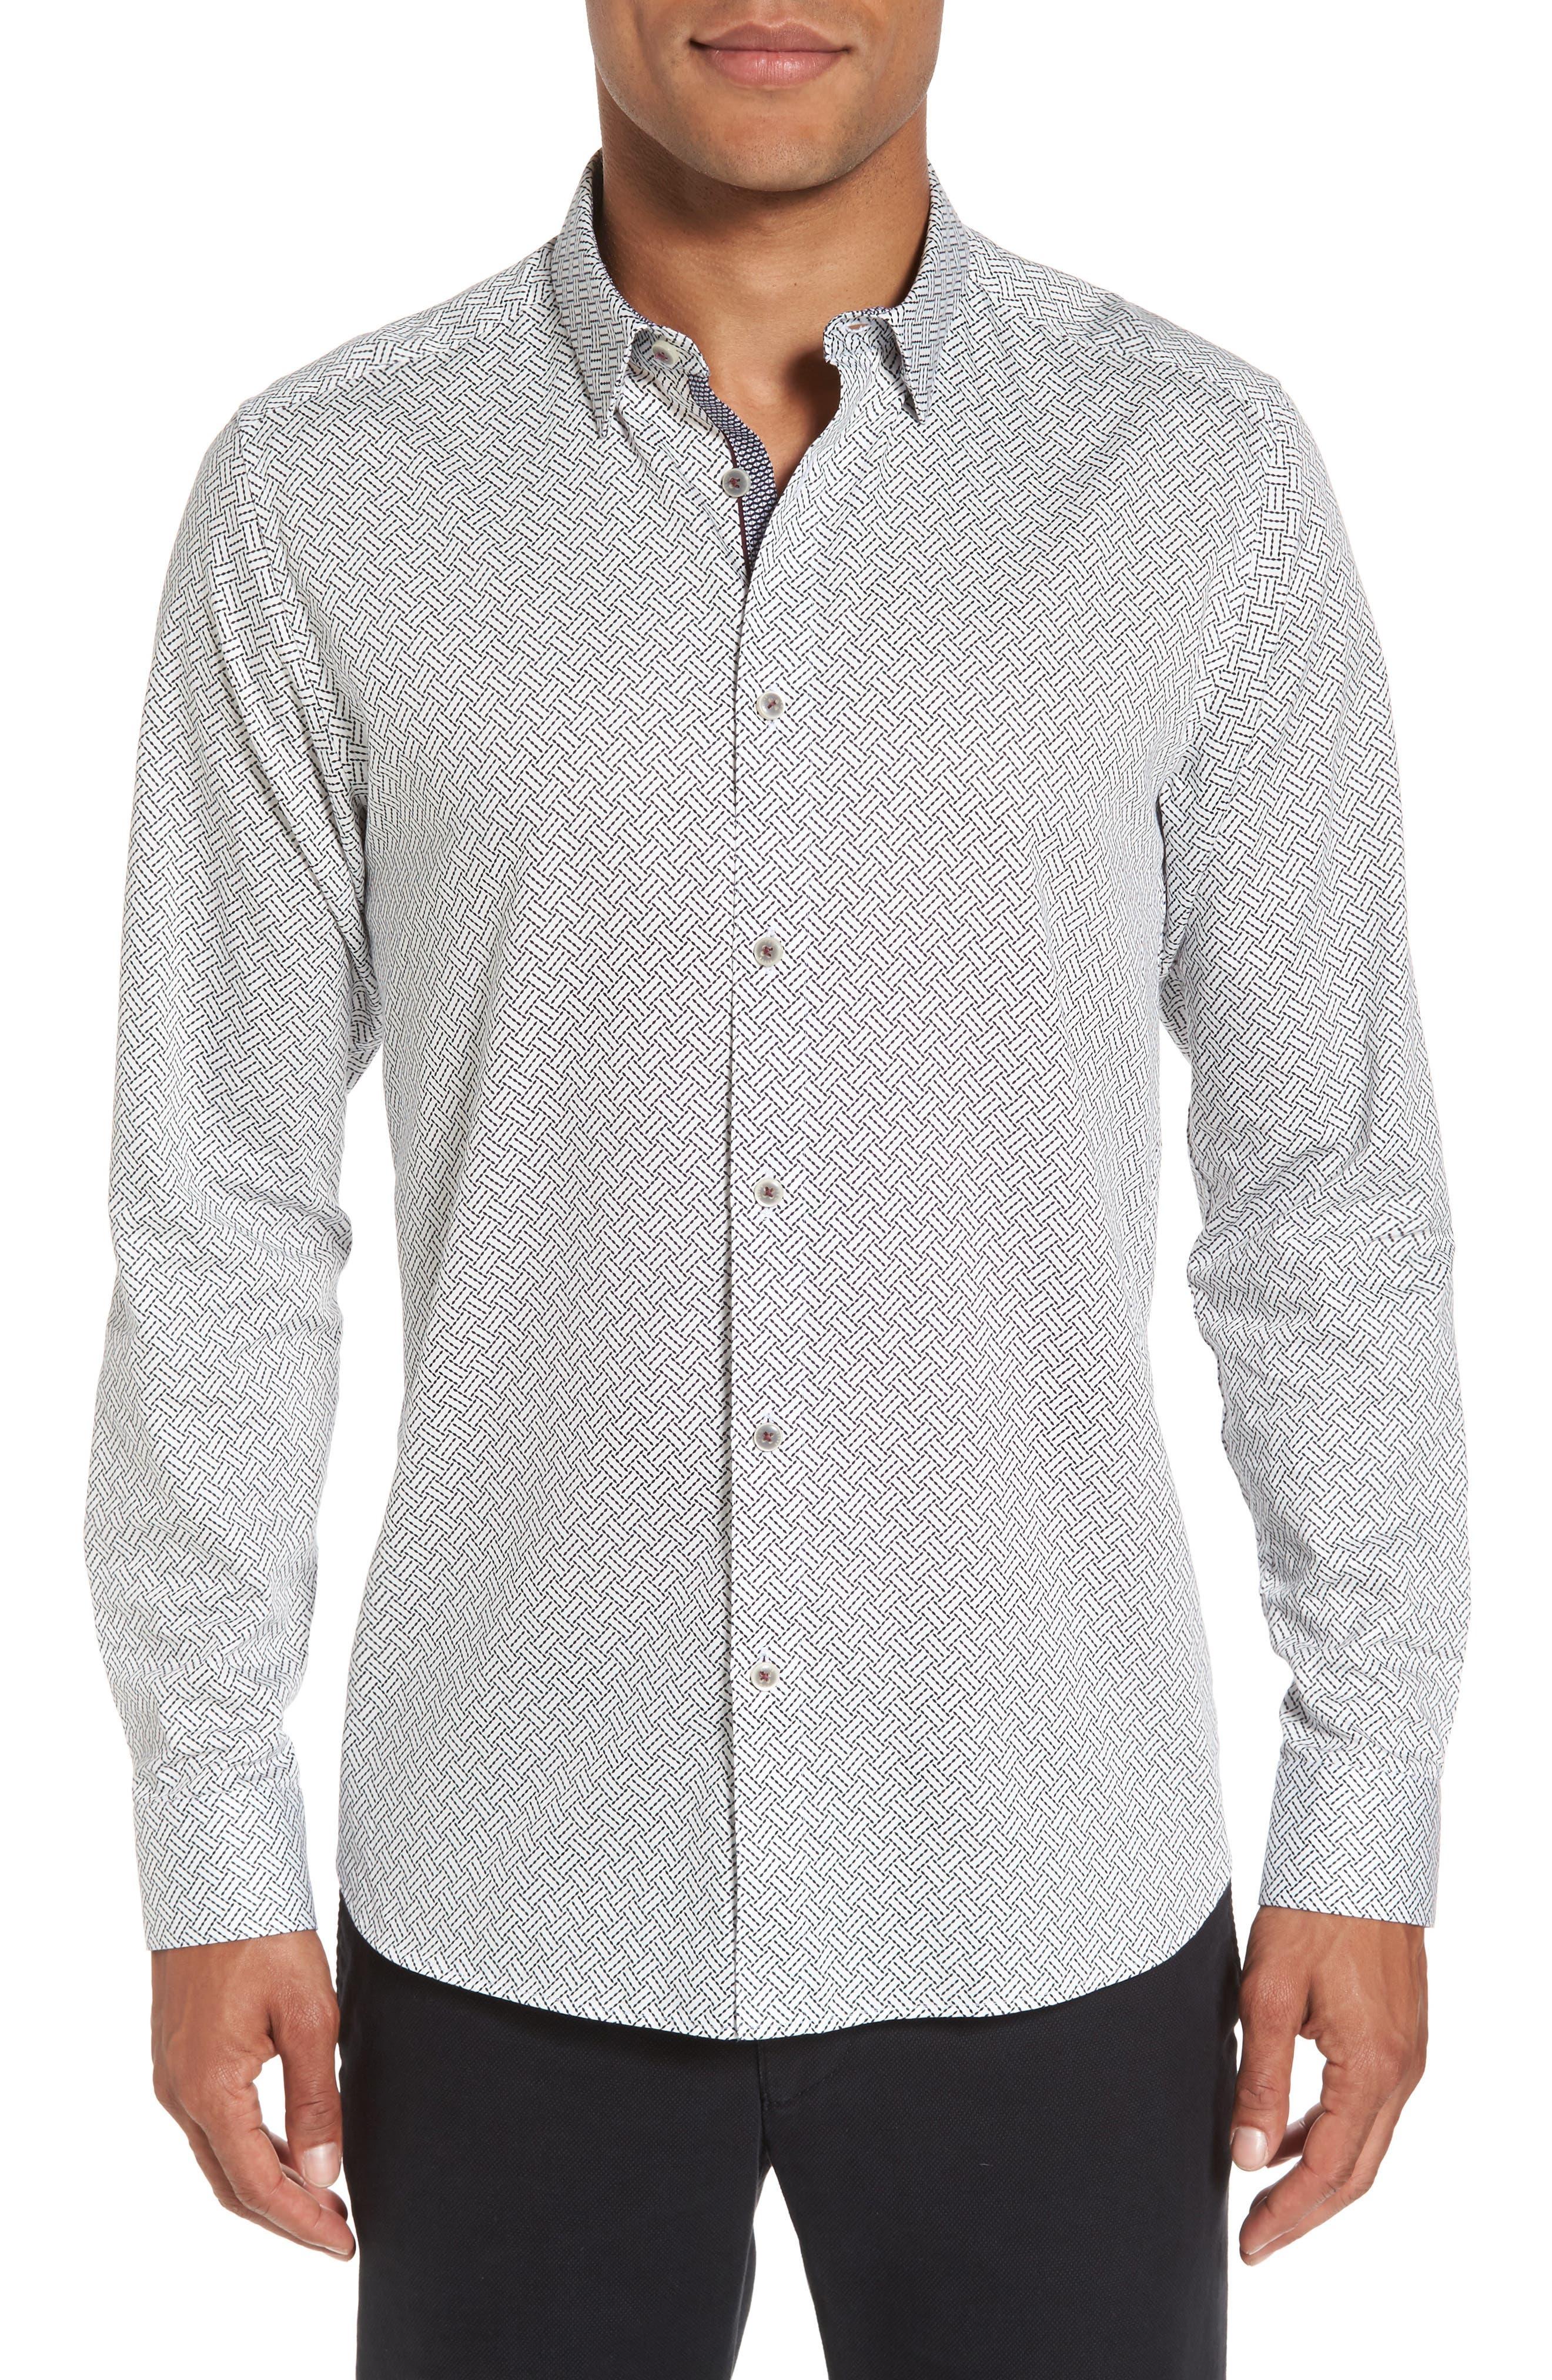 Larosh Slim Fit Basket Weave Print Sport Shirt,                         Main,                         color, 110